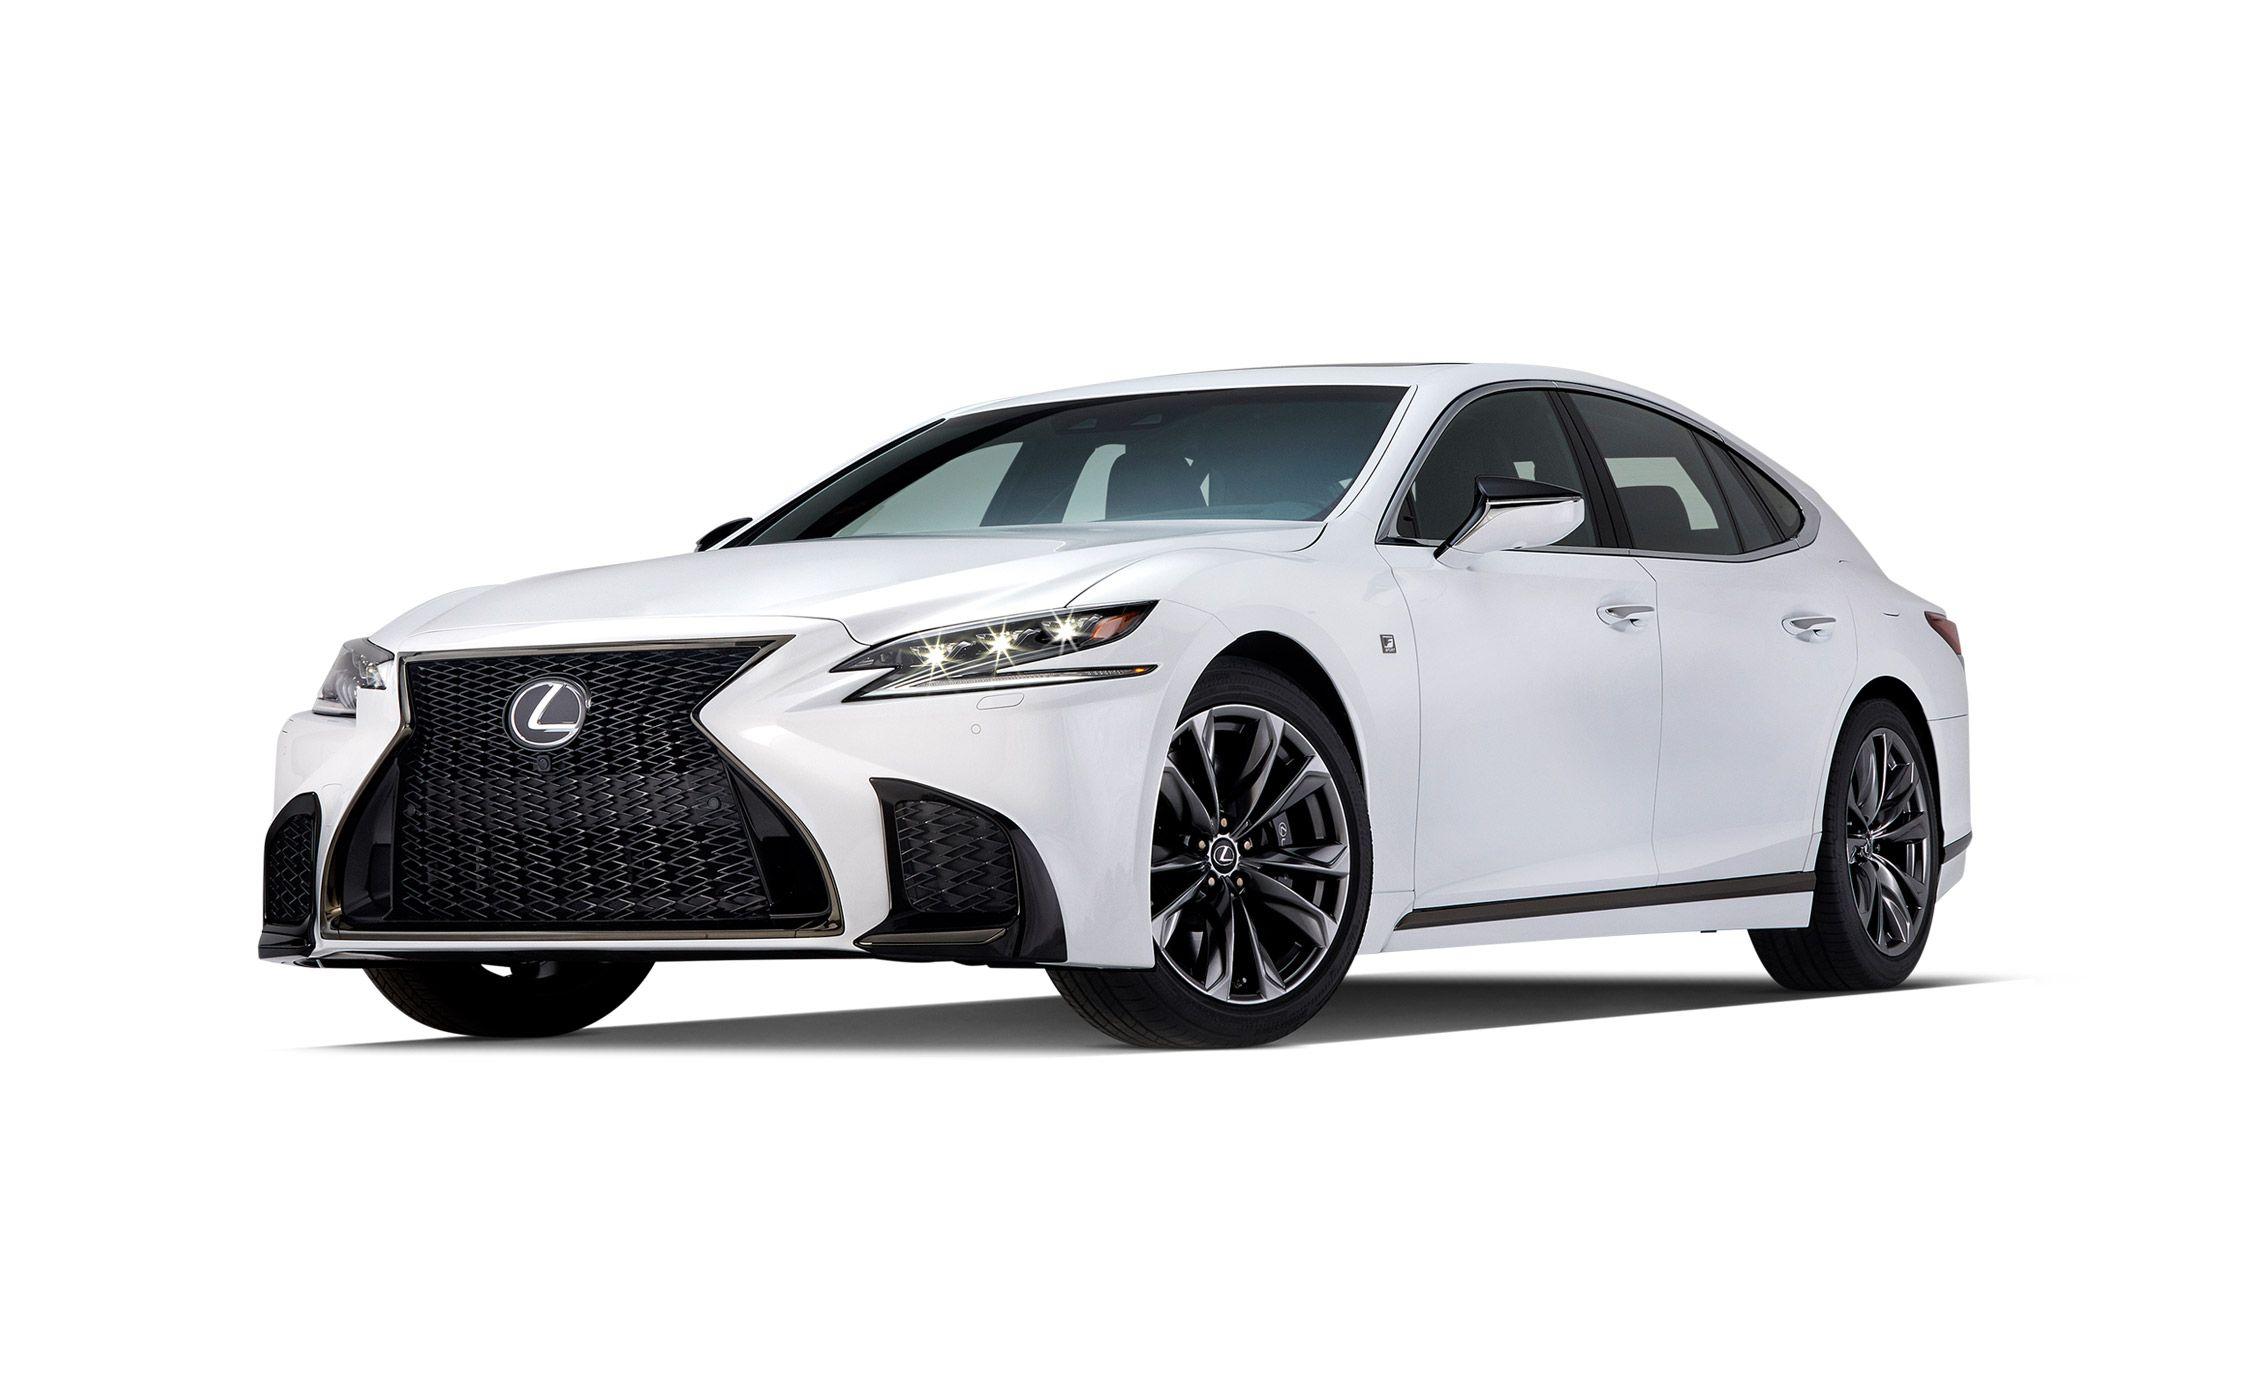 New Cars for 2018: Lexus